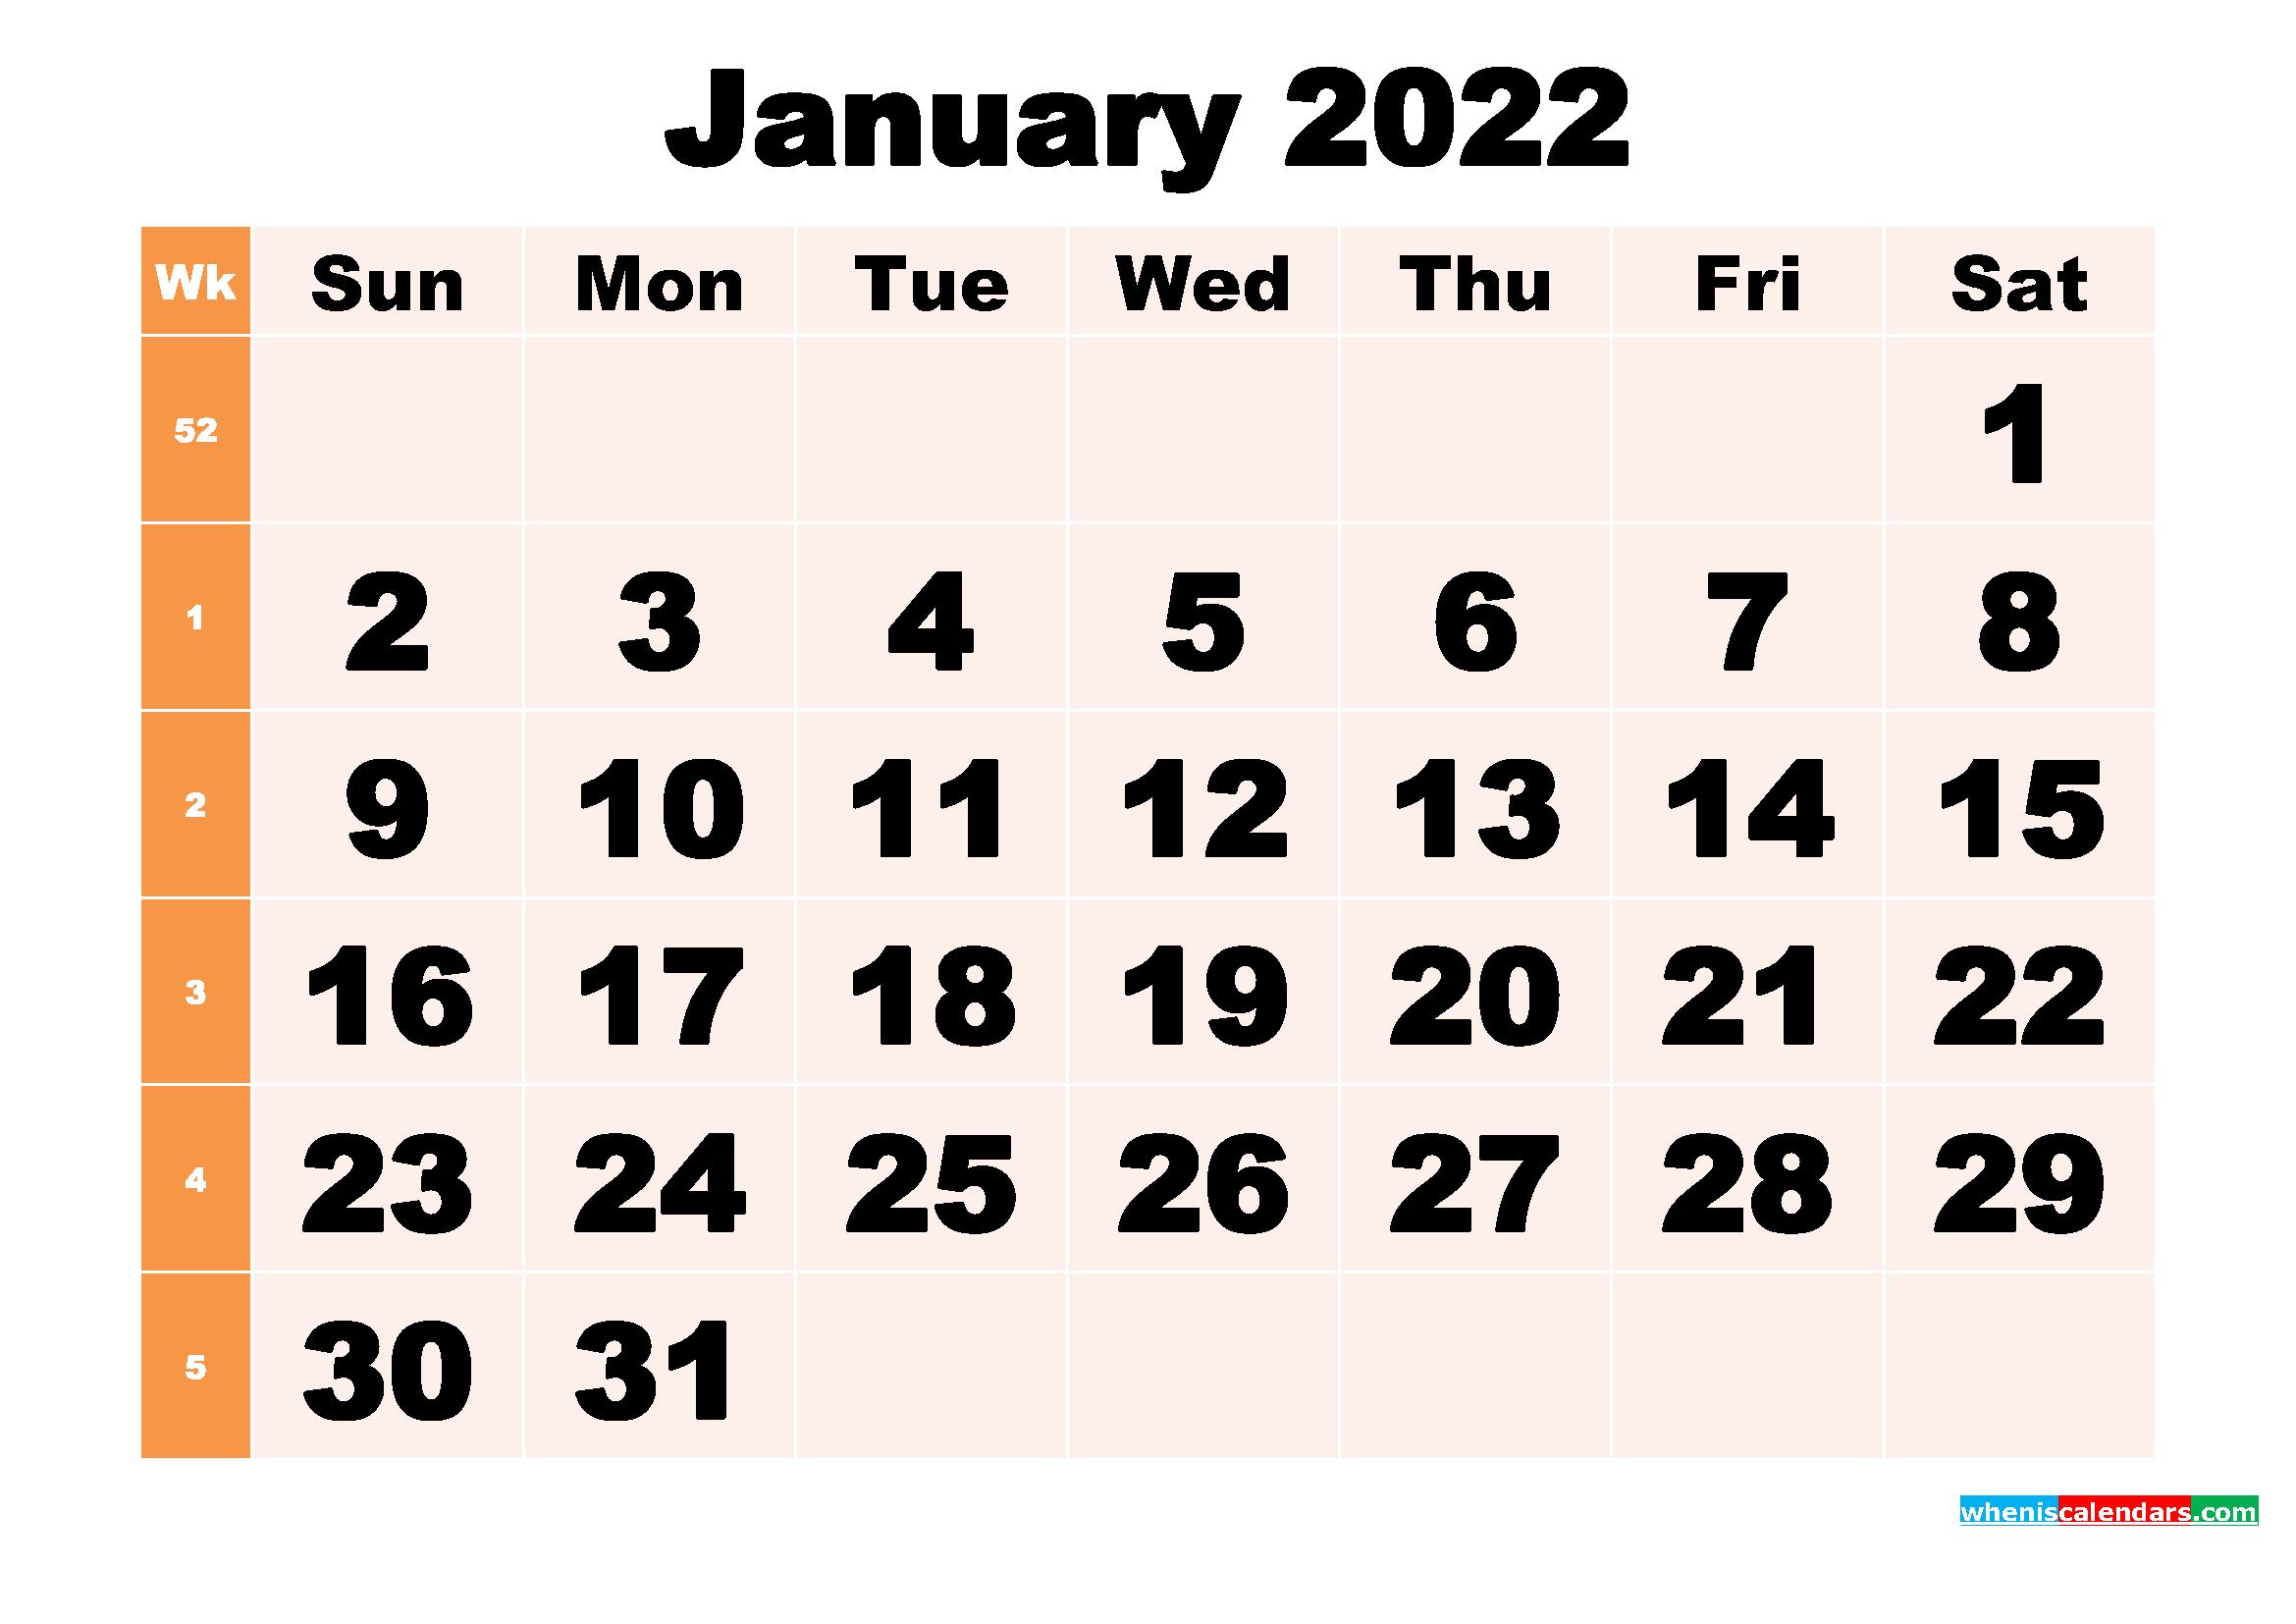 Free Printable January 2022 Calendar Template Word, Pdf with January 2022 Calendar Printable Free Graphics